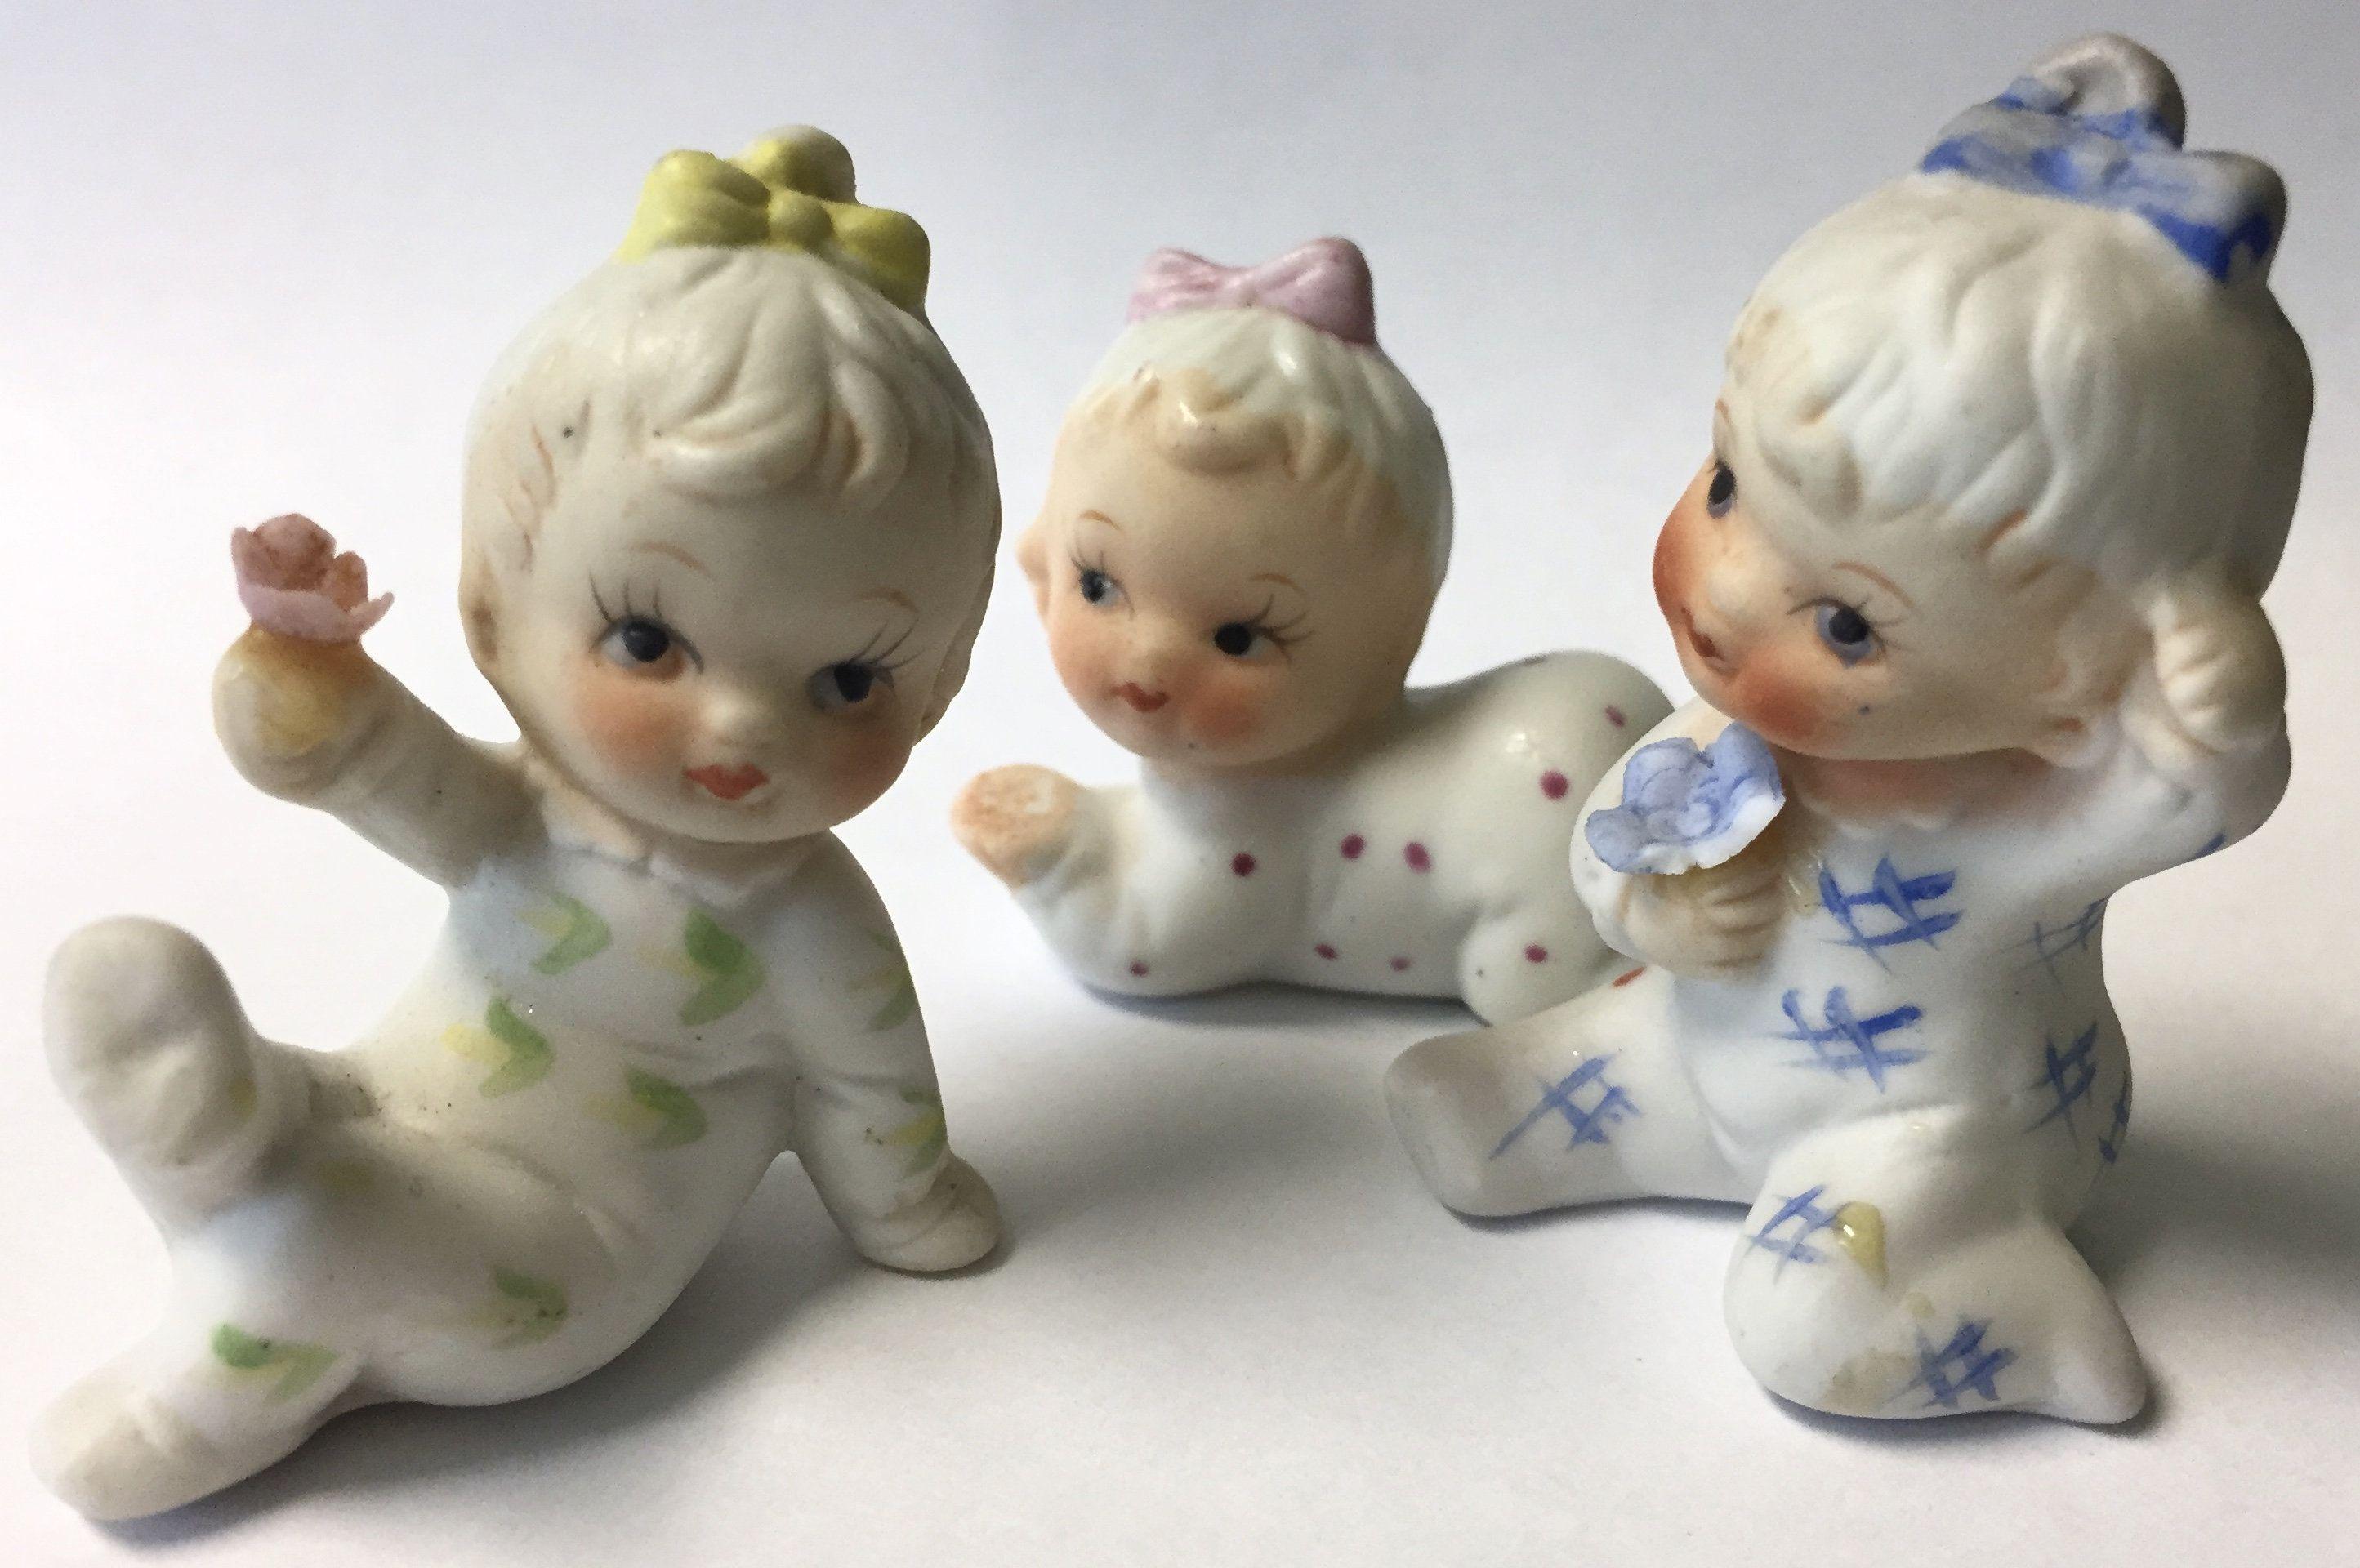 Vintage Bisque Ceramic Miniature Baby Girl Figurines Baby Girls In Pajamas Shadowbox Display Diorama Dollhouse Set Of Three In 2020 Shadow Box Miniature Figurines Figurines